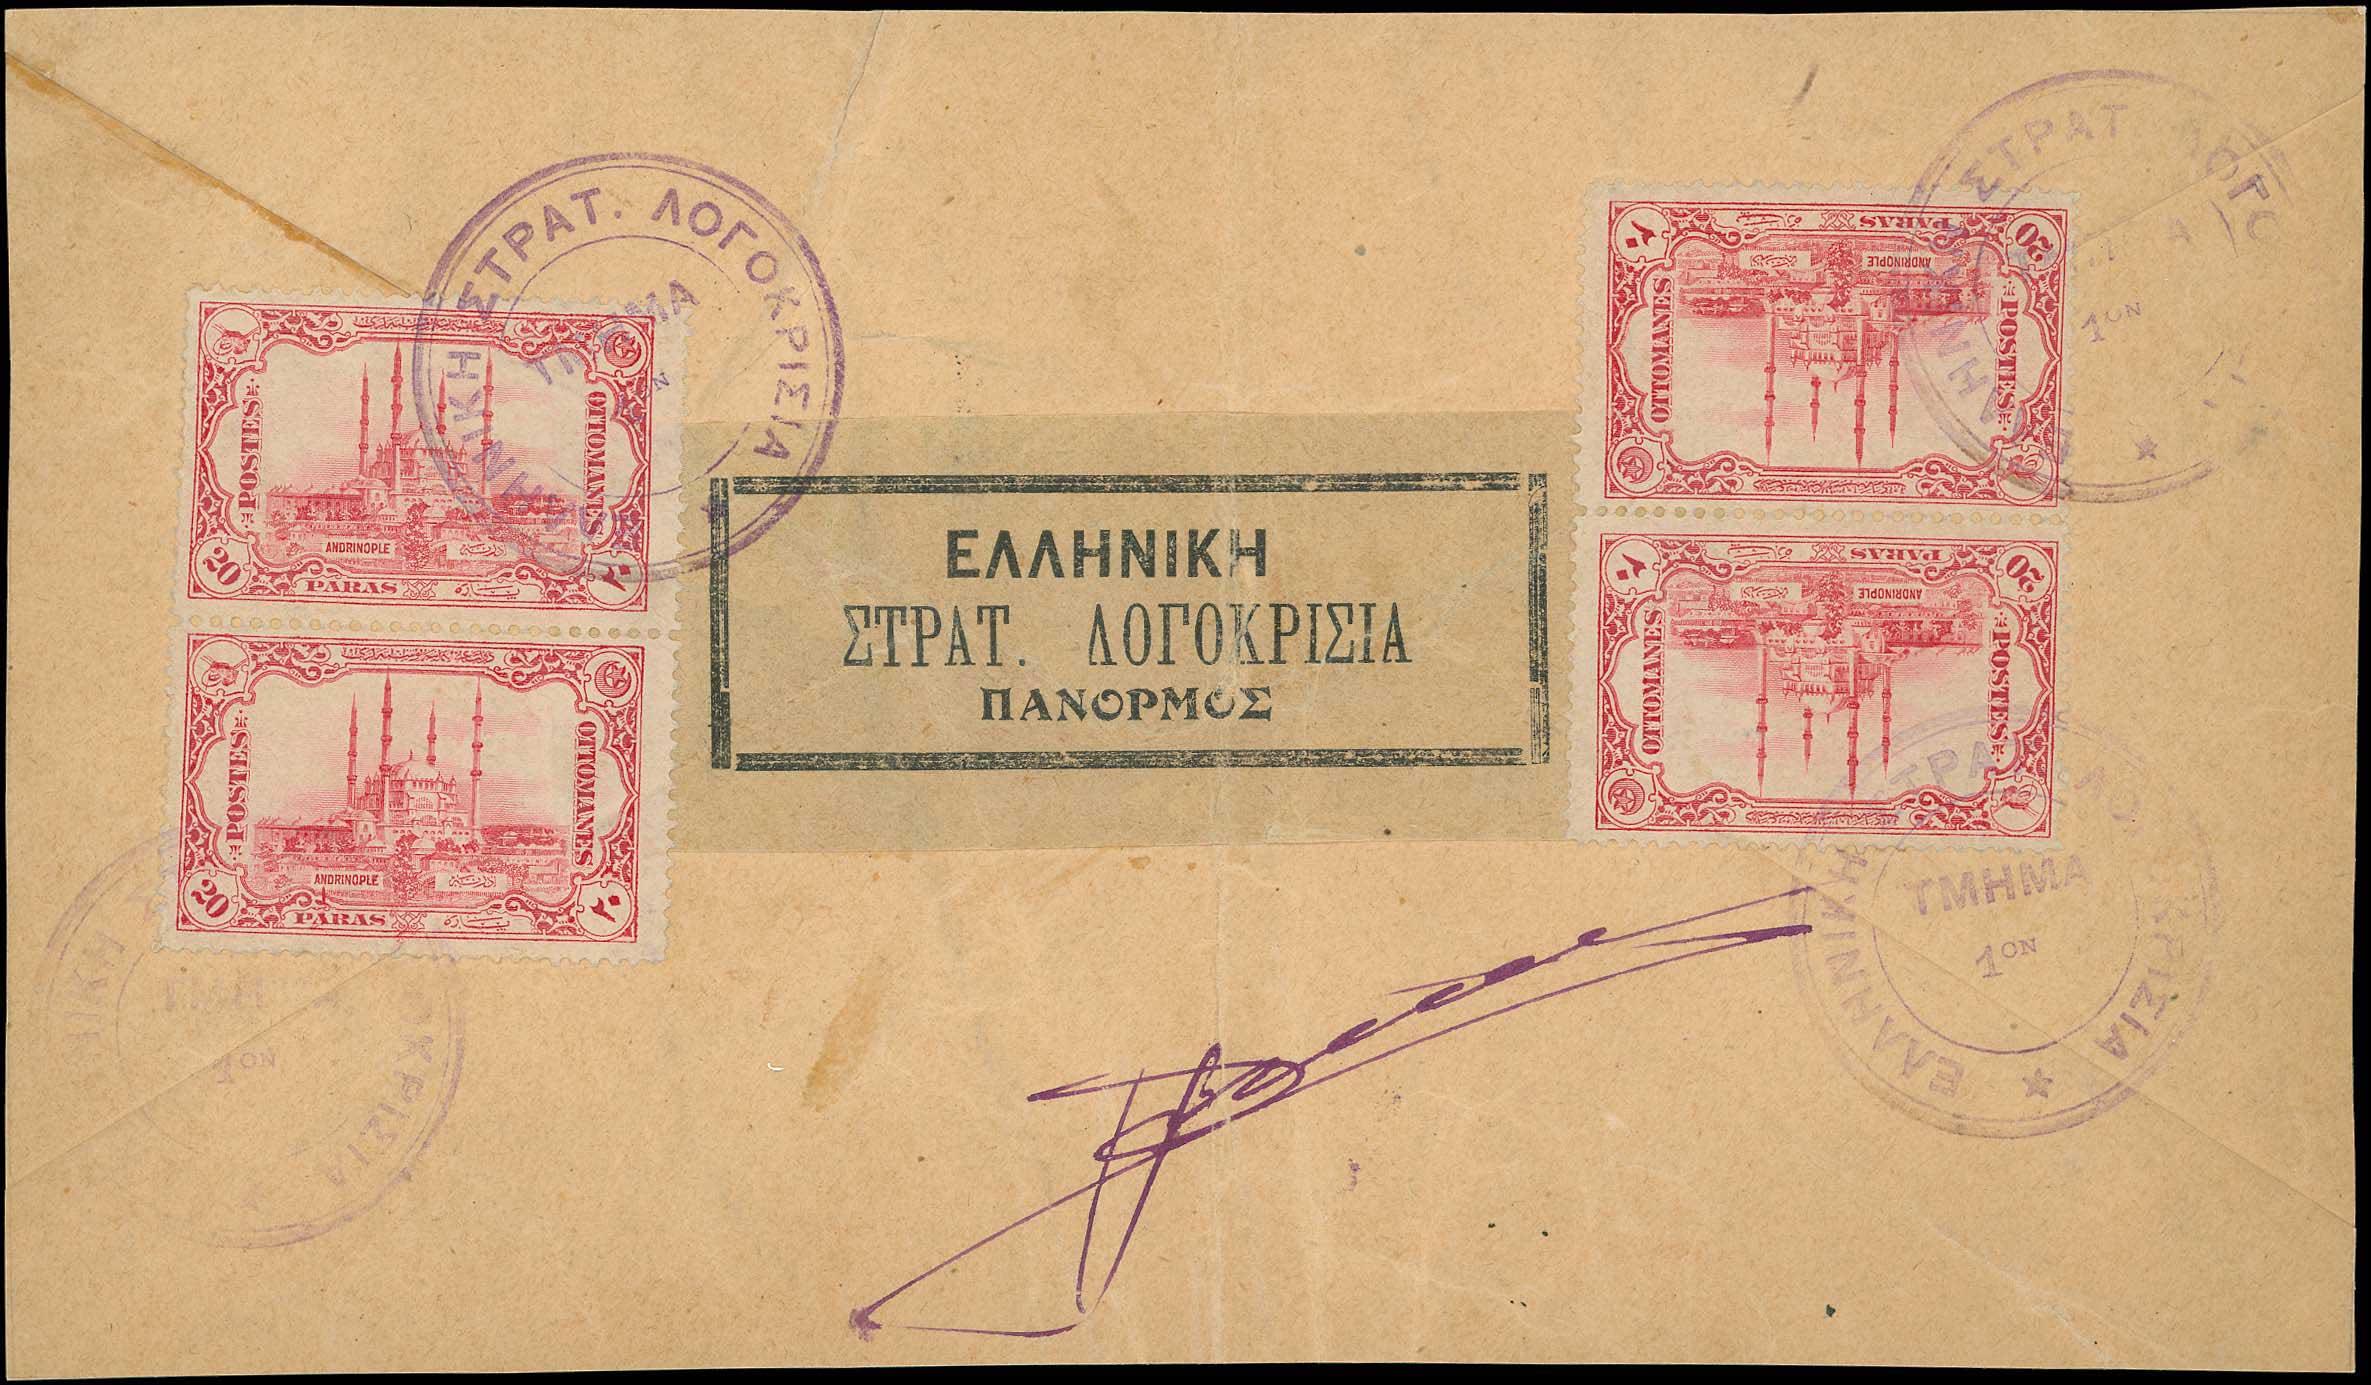 Lot 820 - SMYRNE,CONS/PLE & ASIA MINOR (before 1922) SMYRNE,CONS/PLE & ASIA MINOR (before 1922) -  A. Karamitsos Public & Live Internet Auction 672